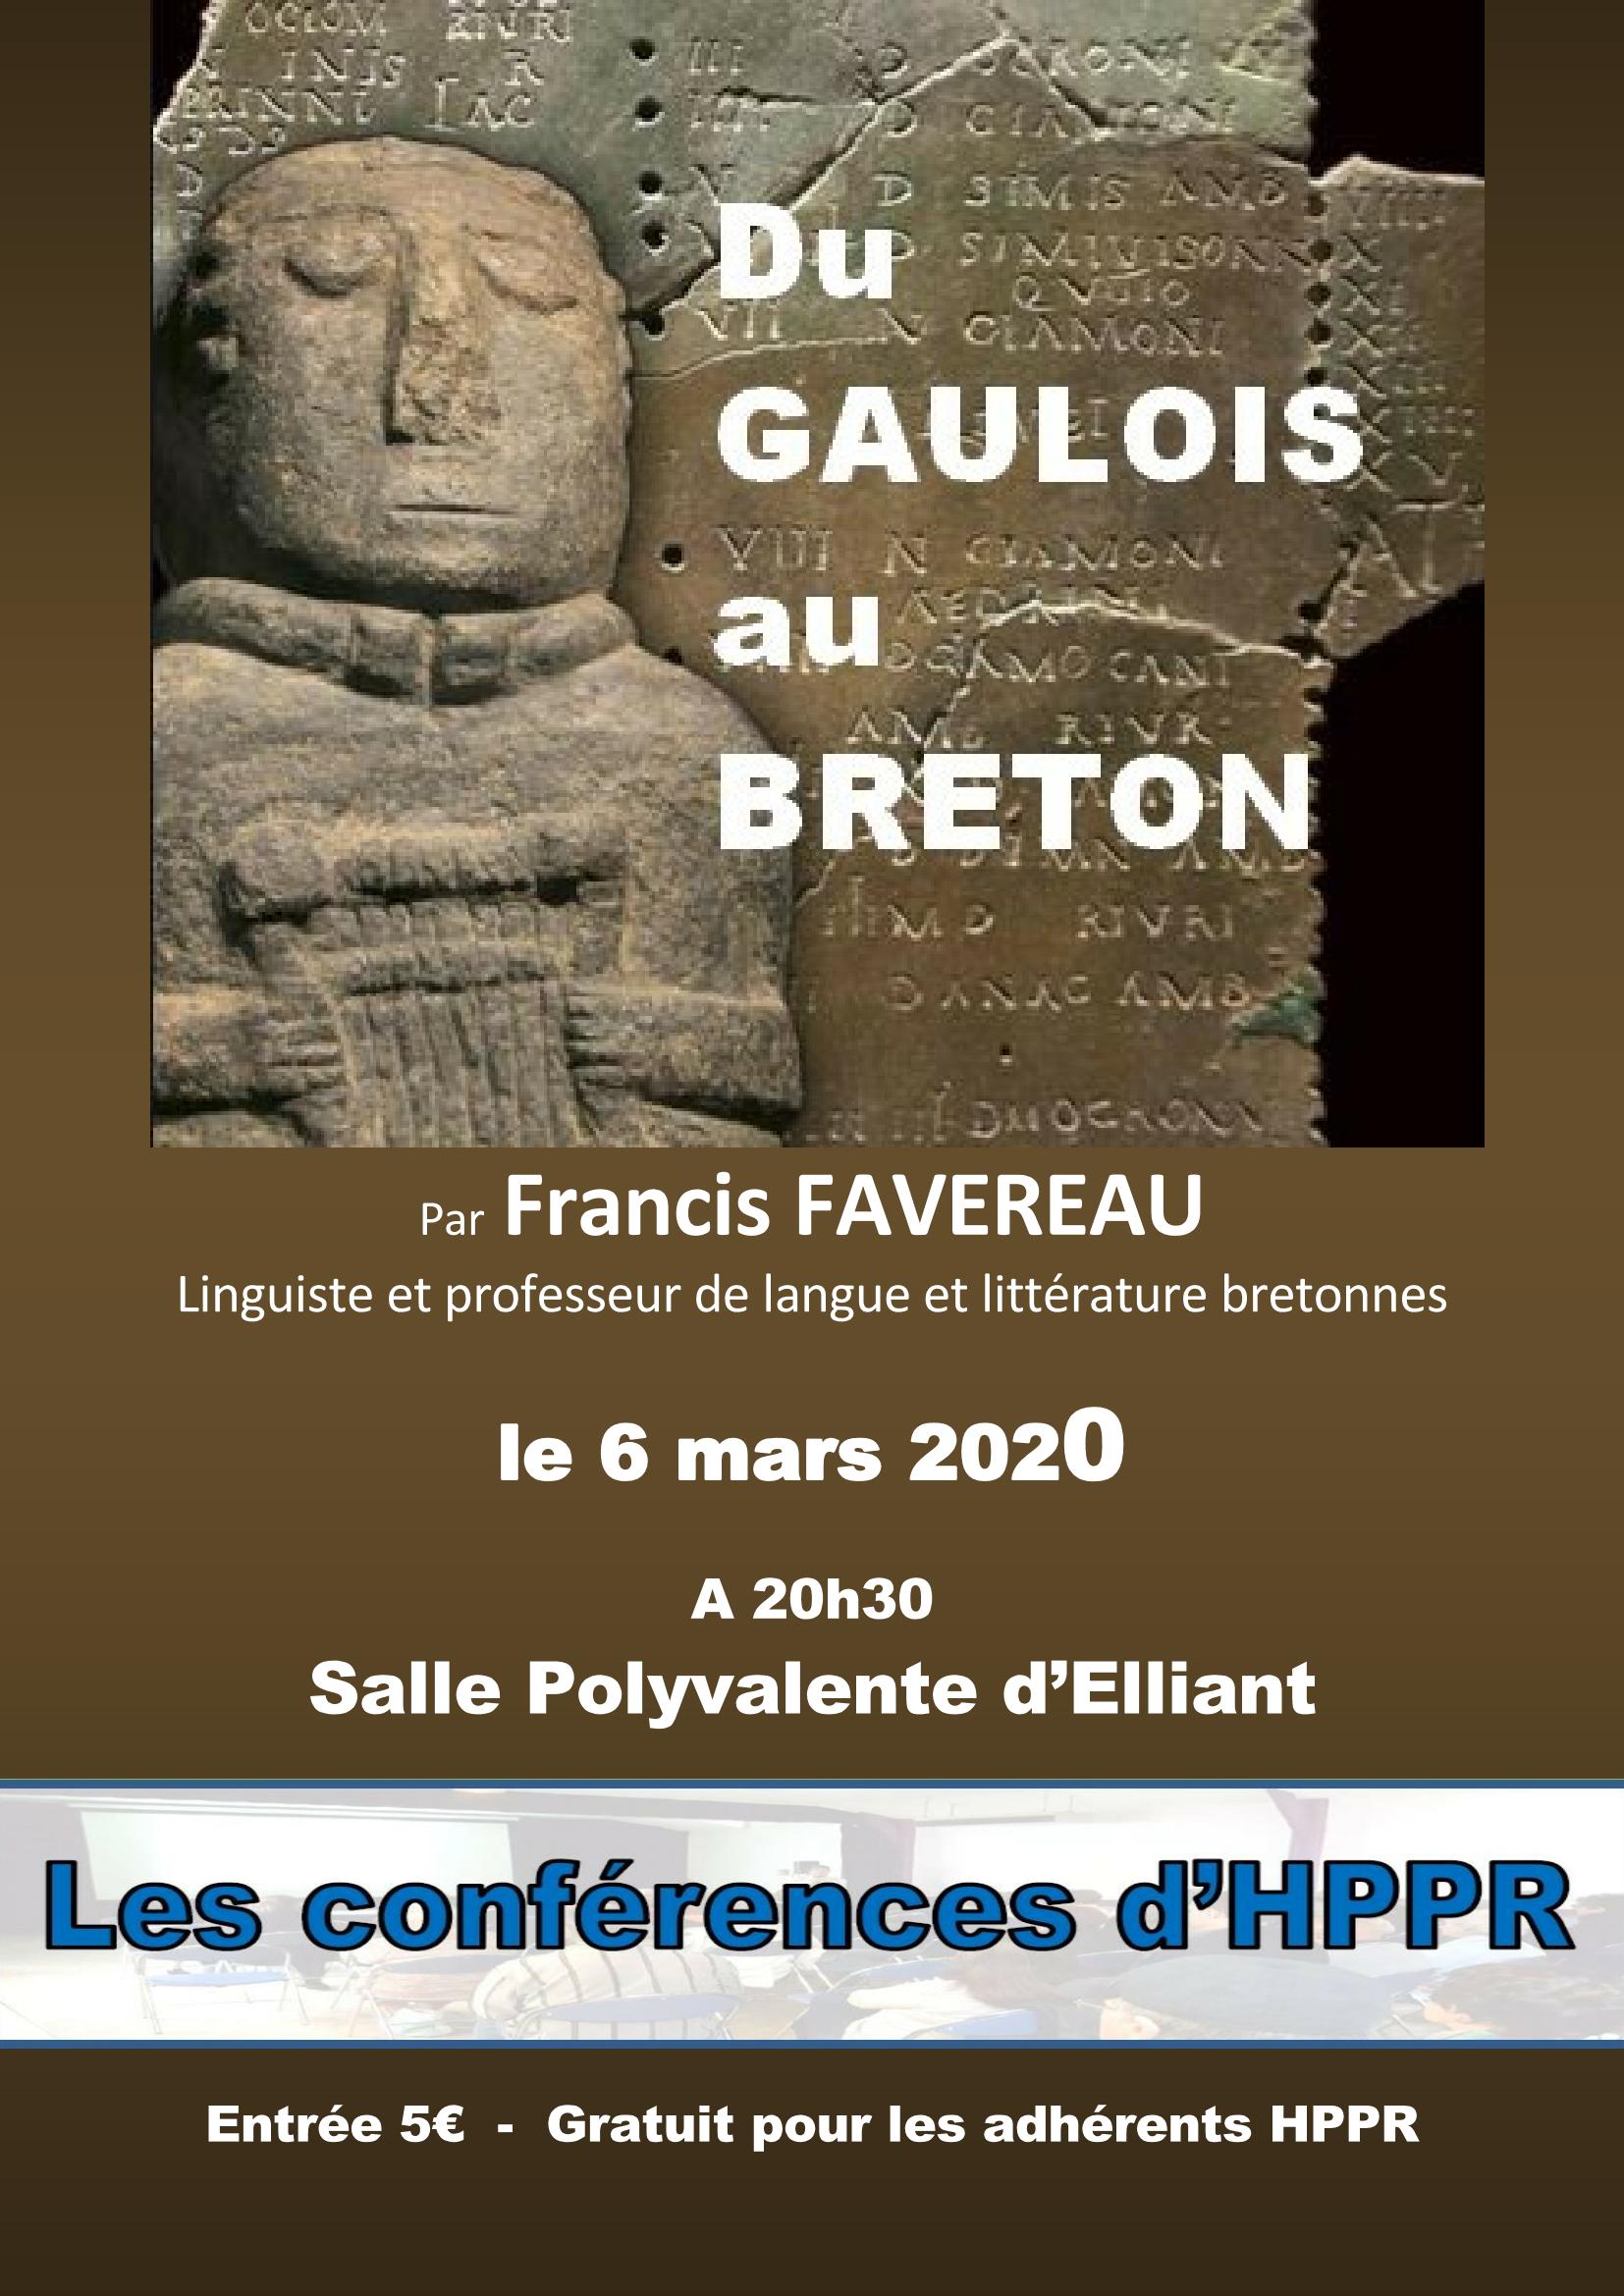 Francis FAVEREAU